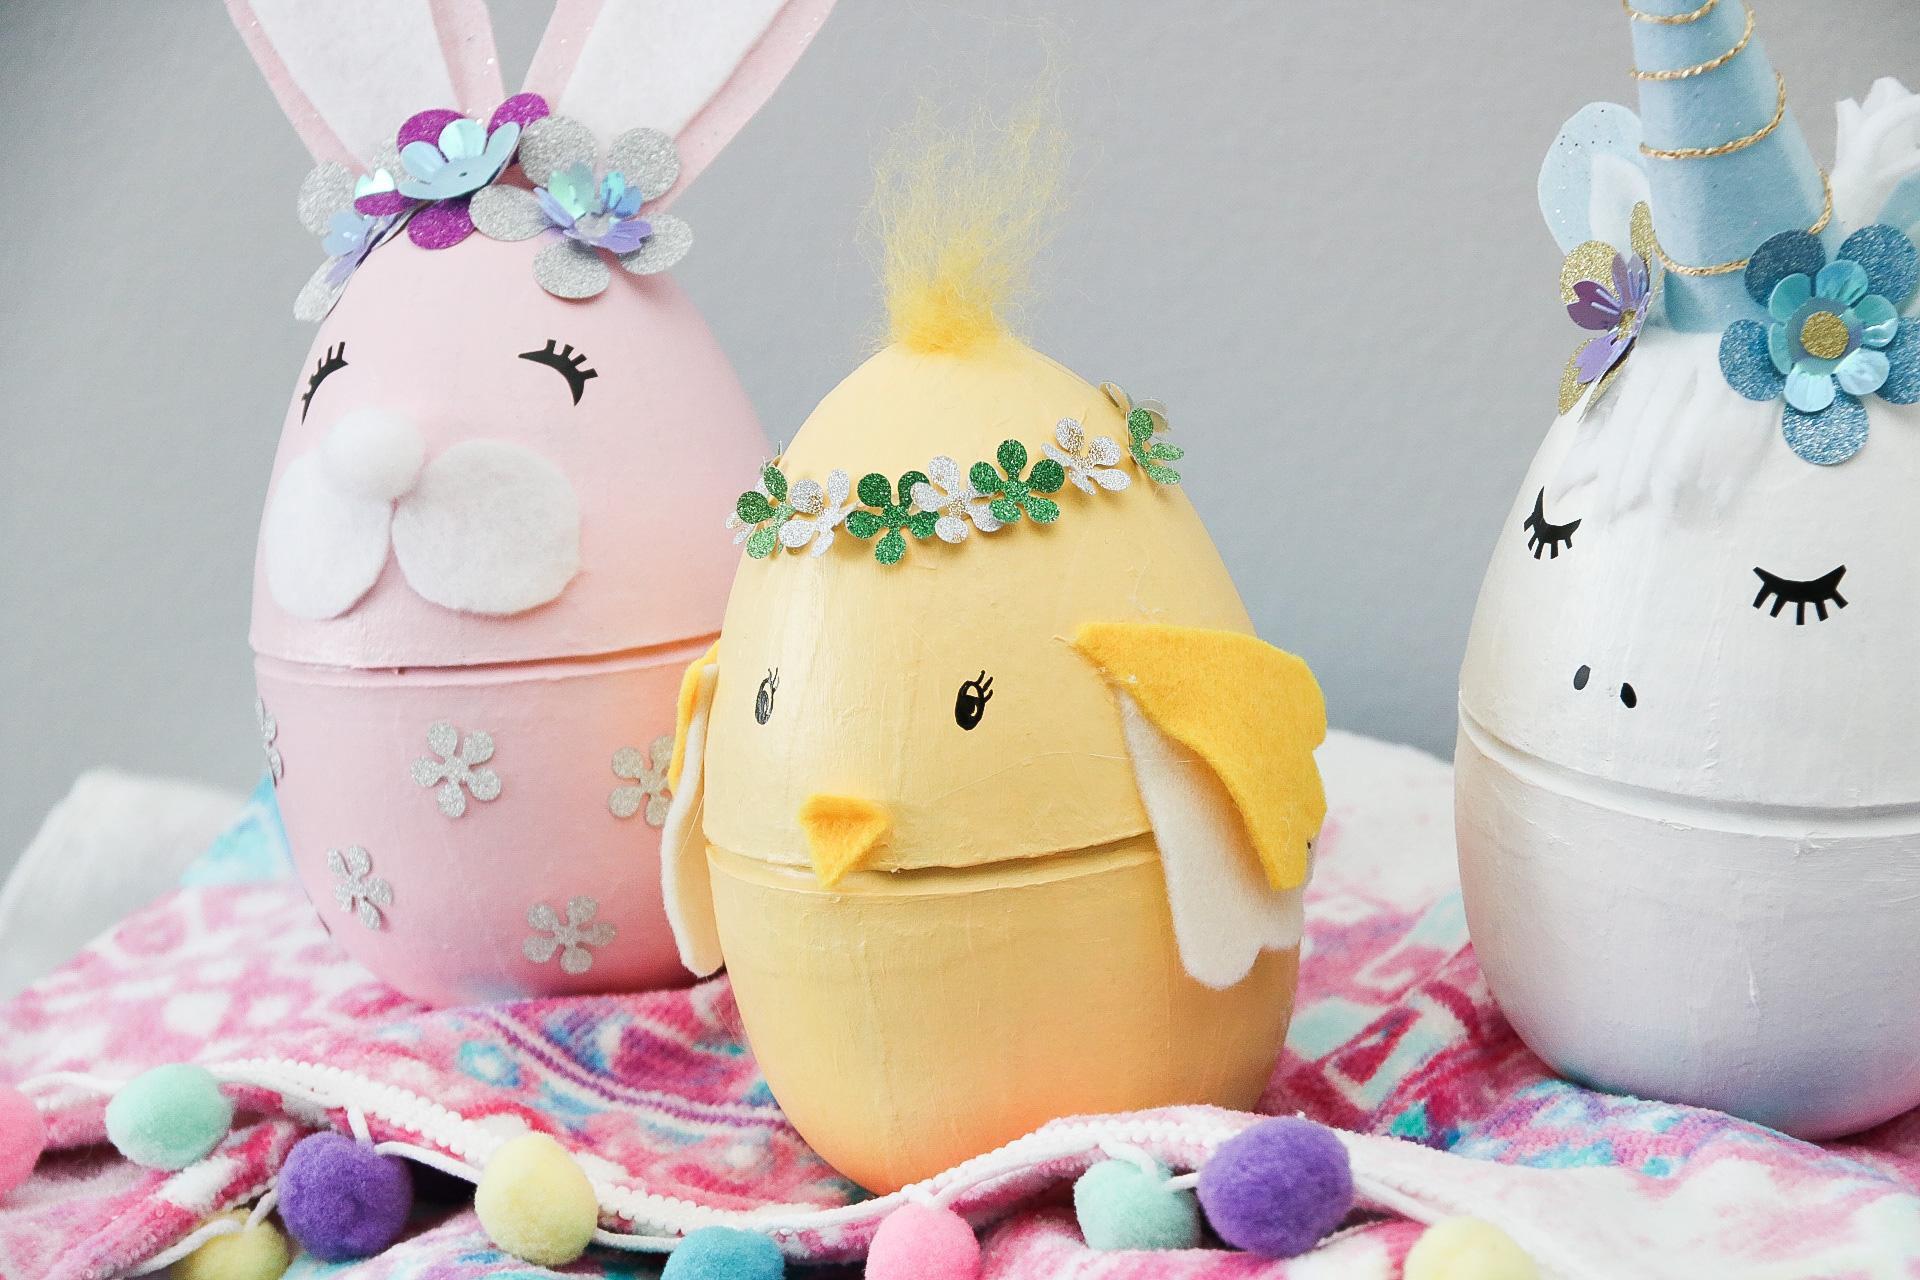 Påskpyssla ägg